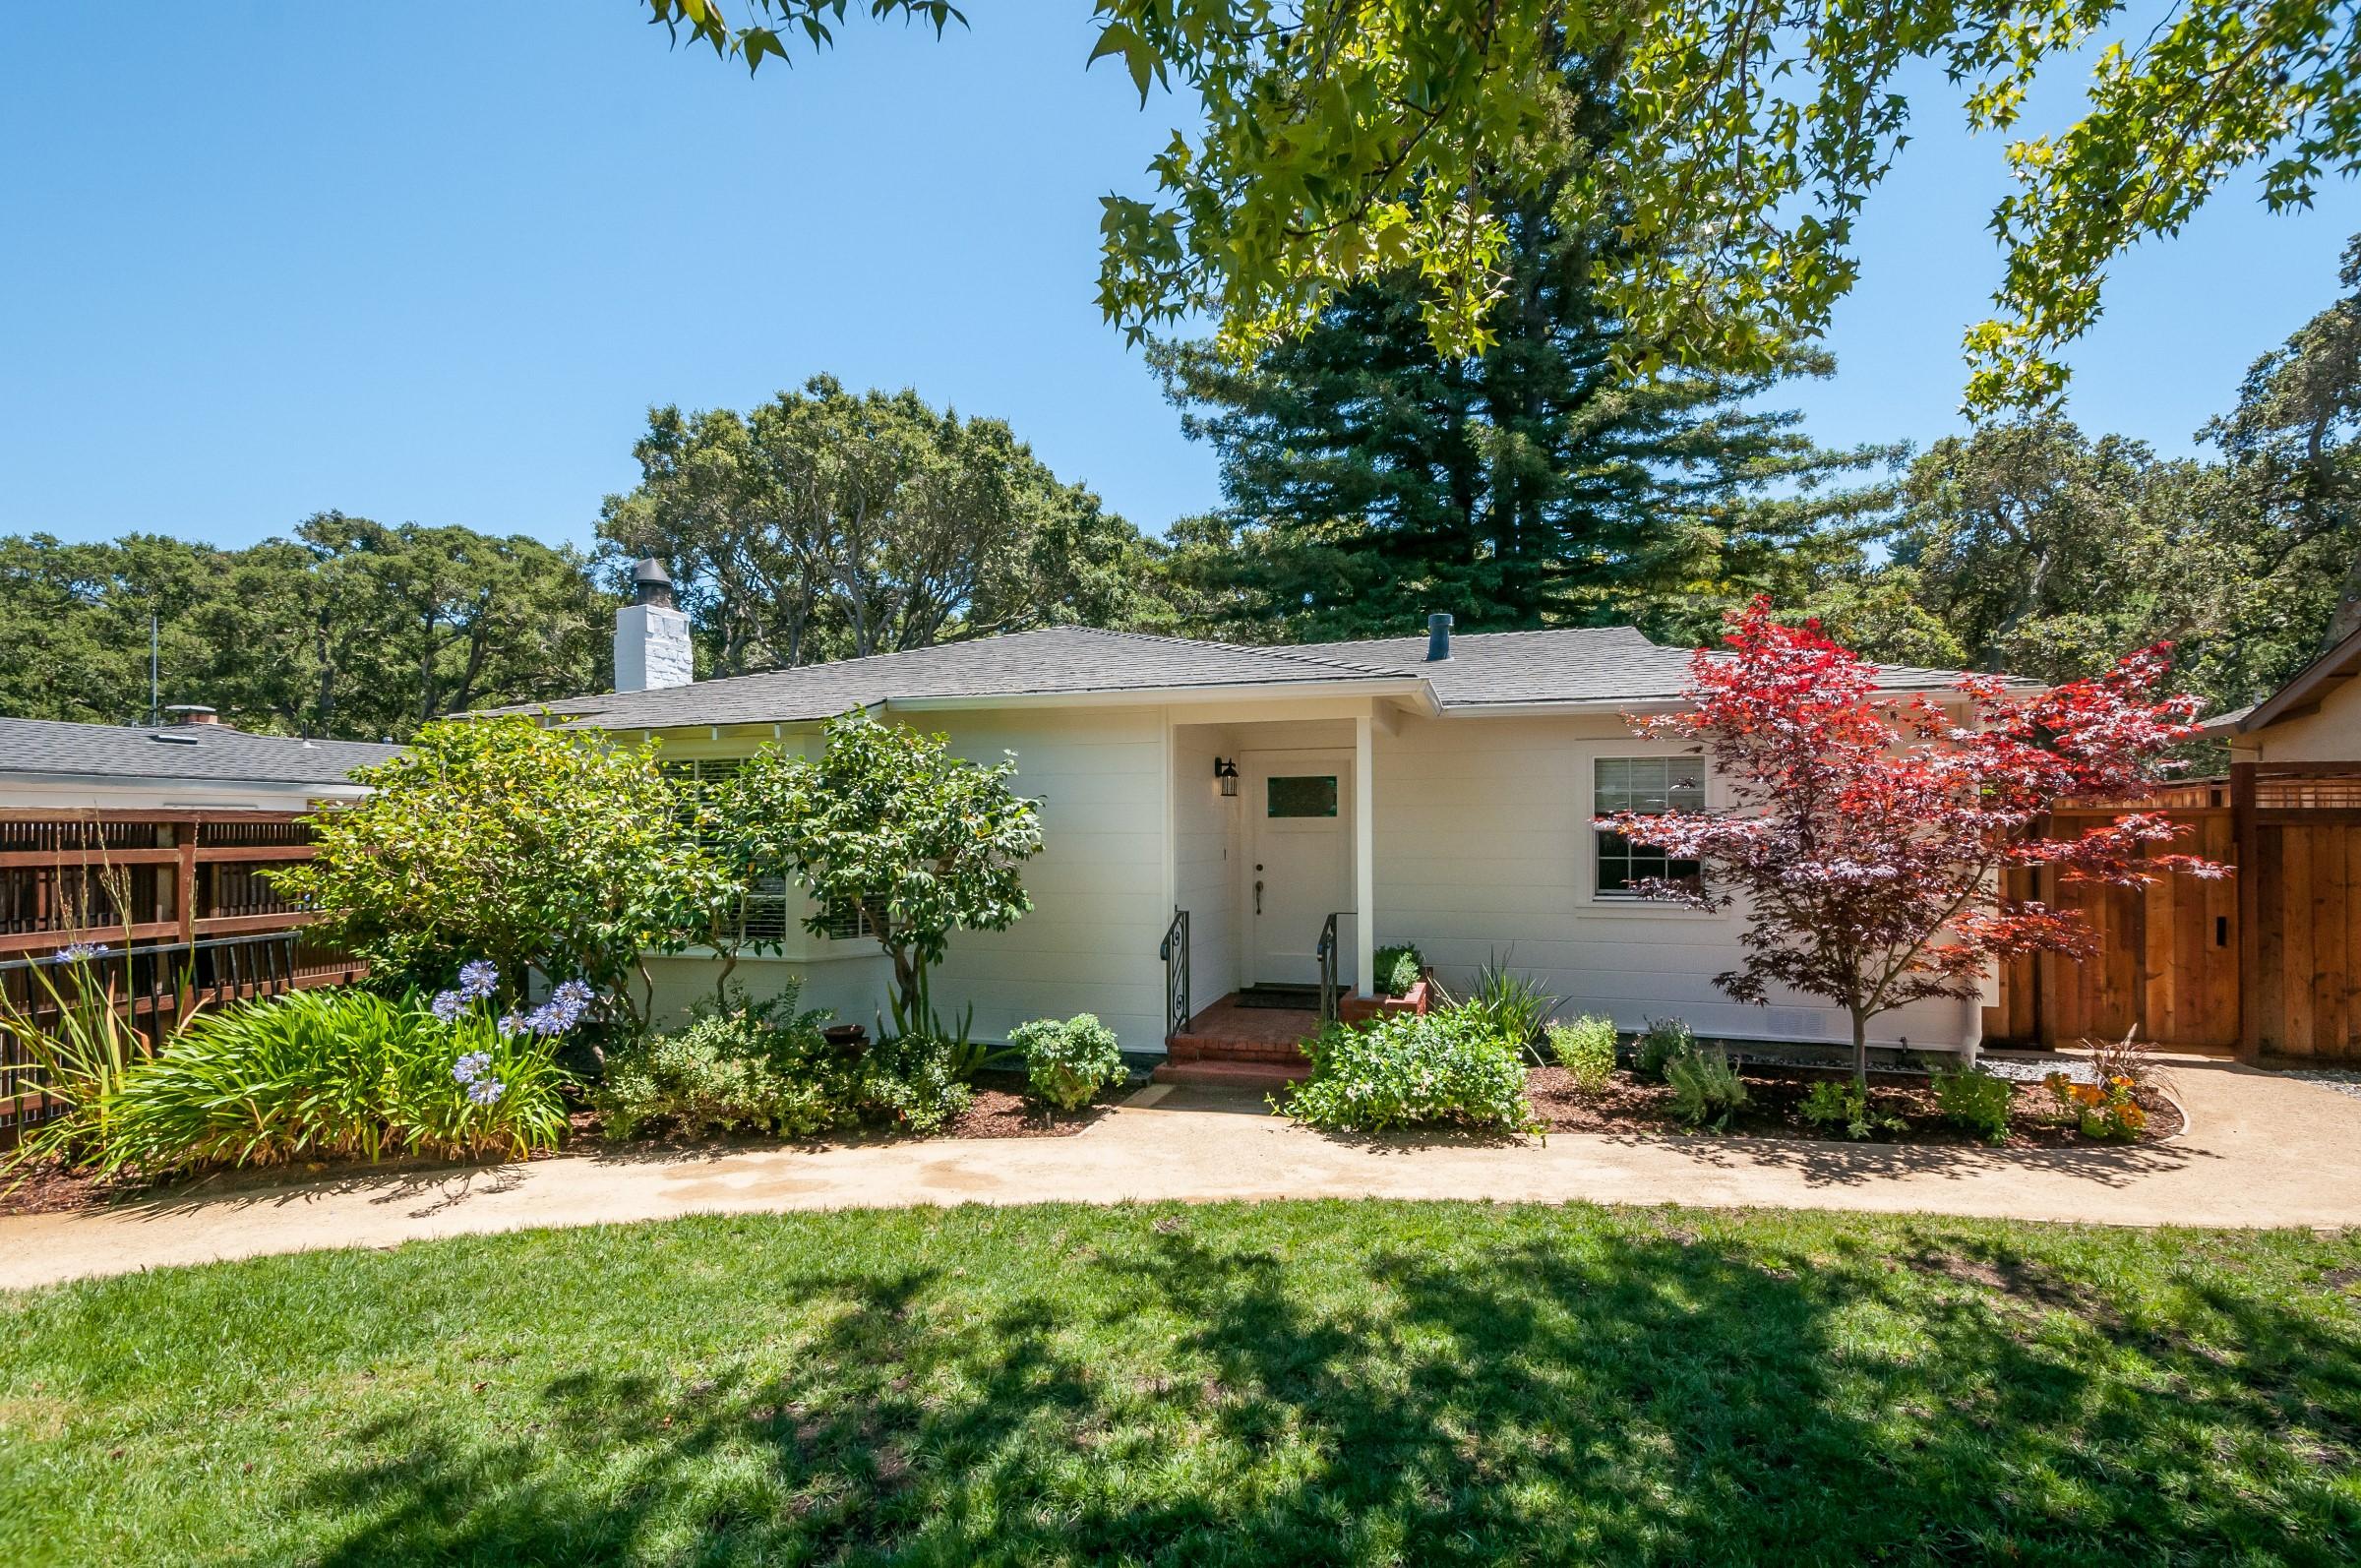 1529 Ralston Ave, Belmont, CA 94002